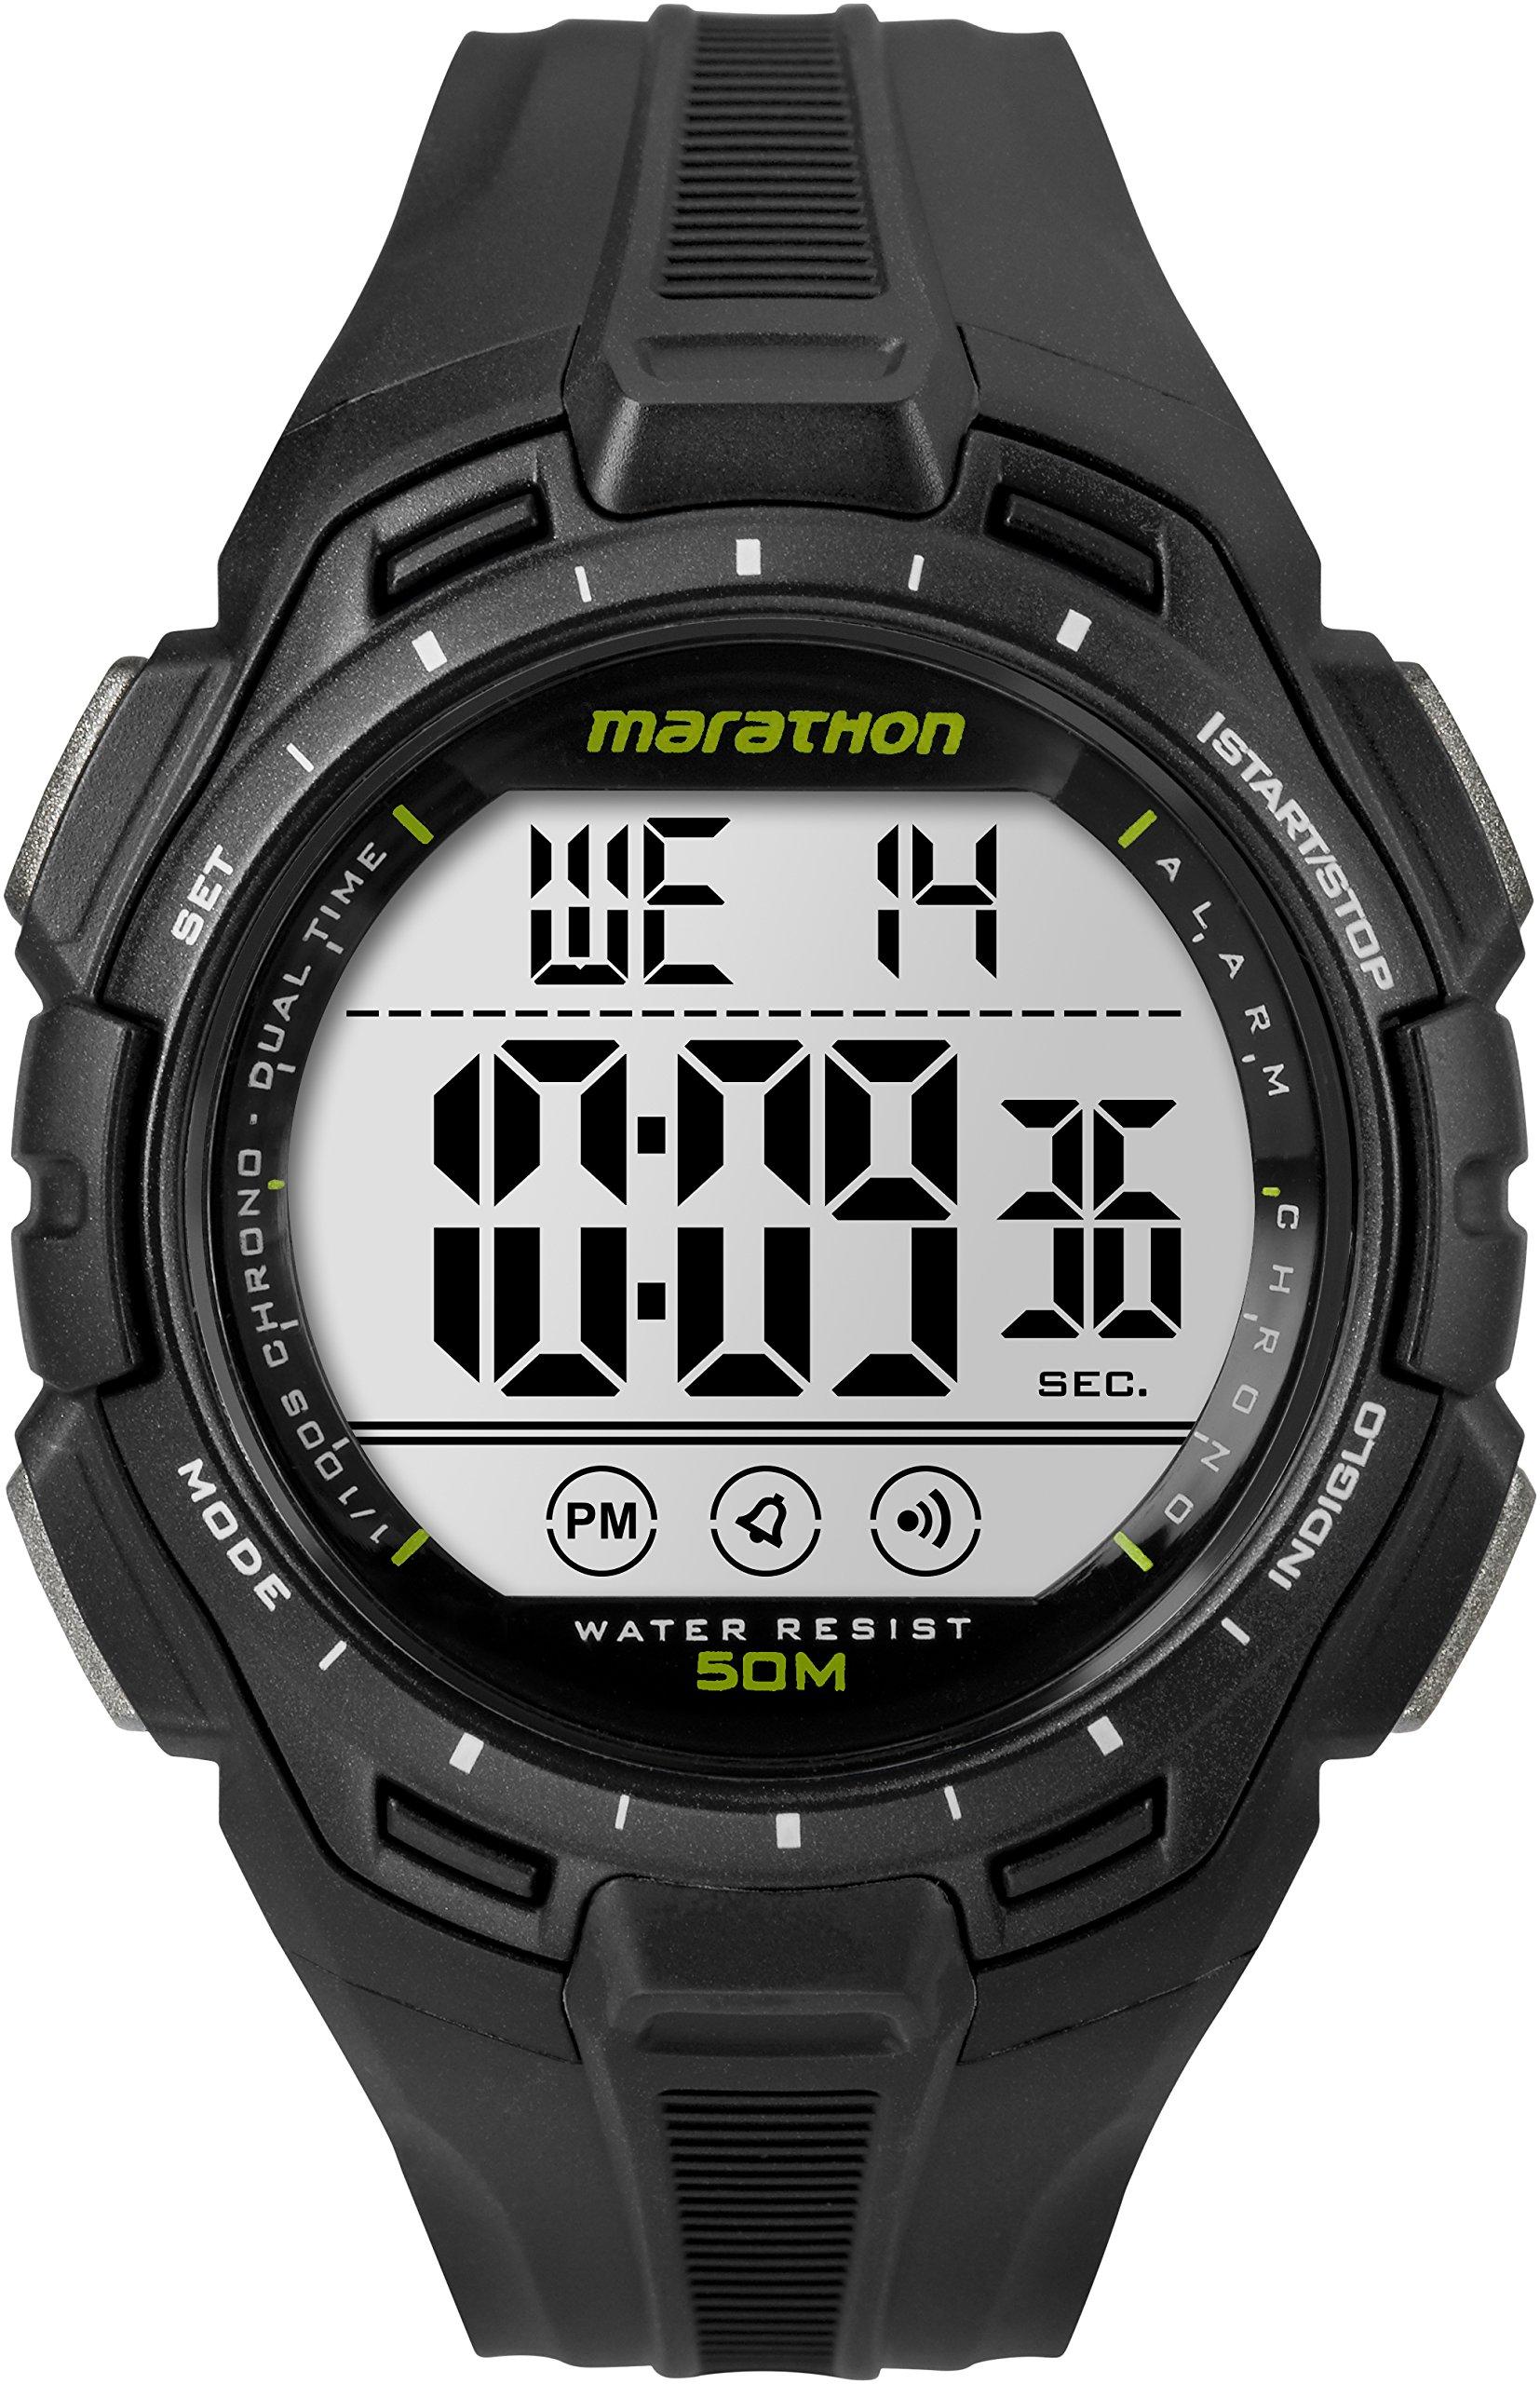 Marathon Timex TW5K94800 Digital Full Size